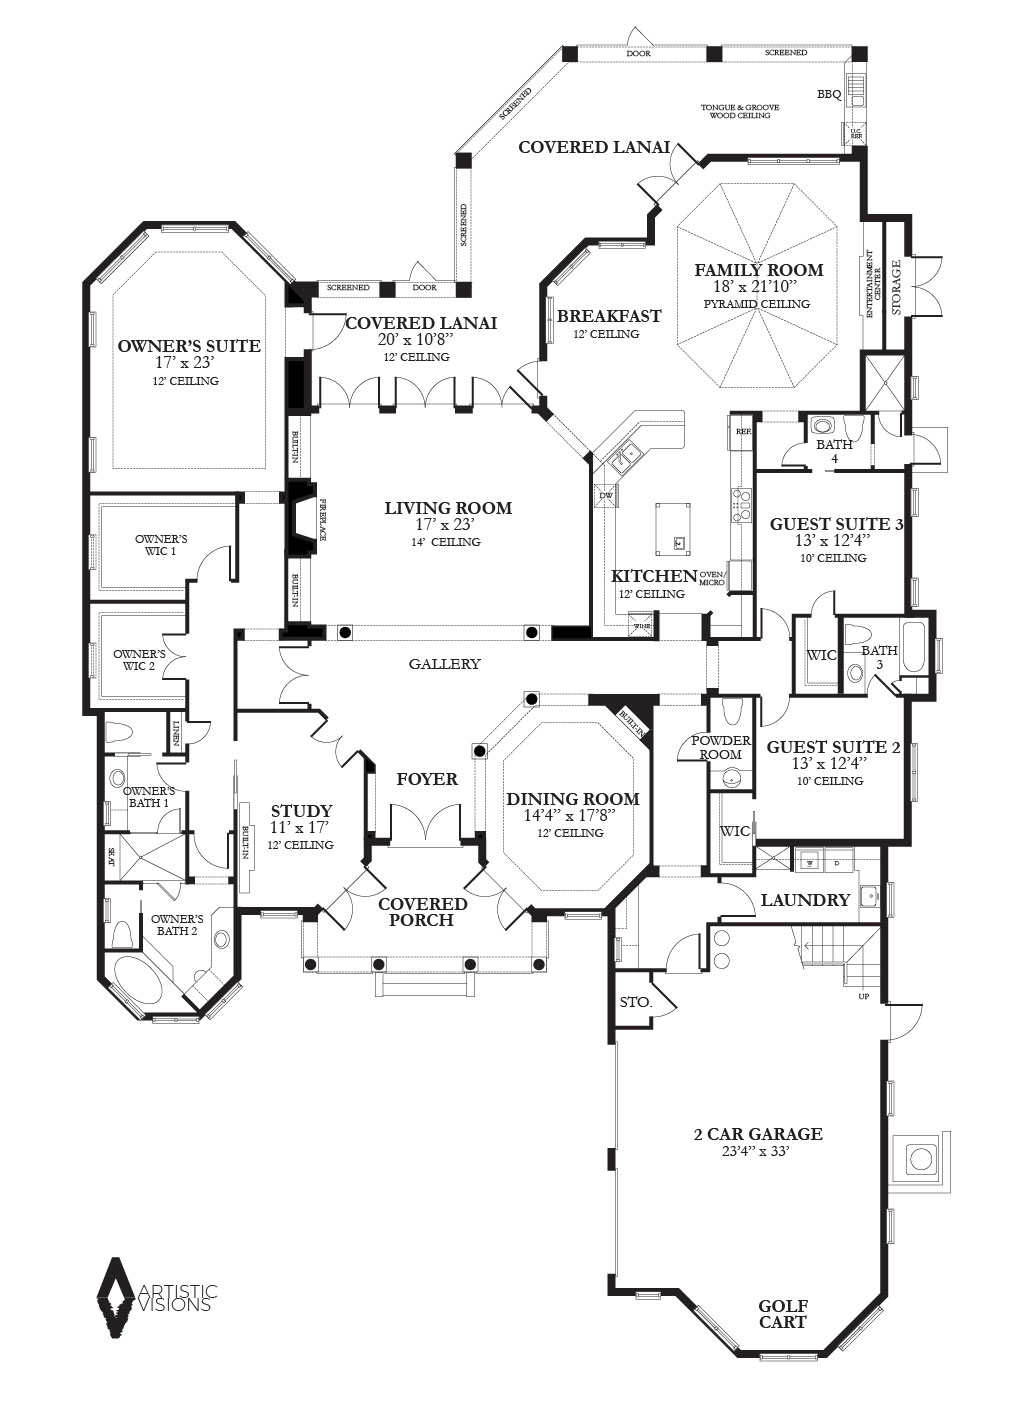 Floor Plans Artistic Visions